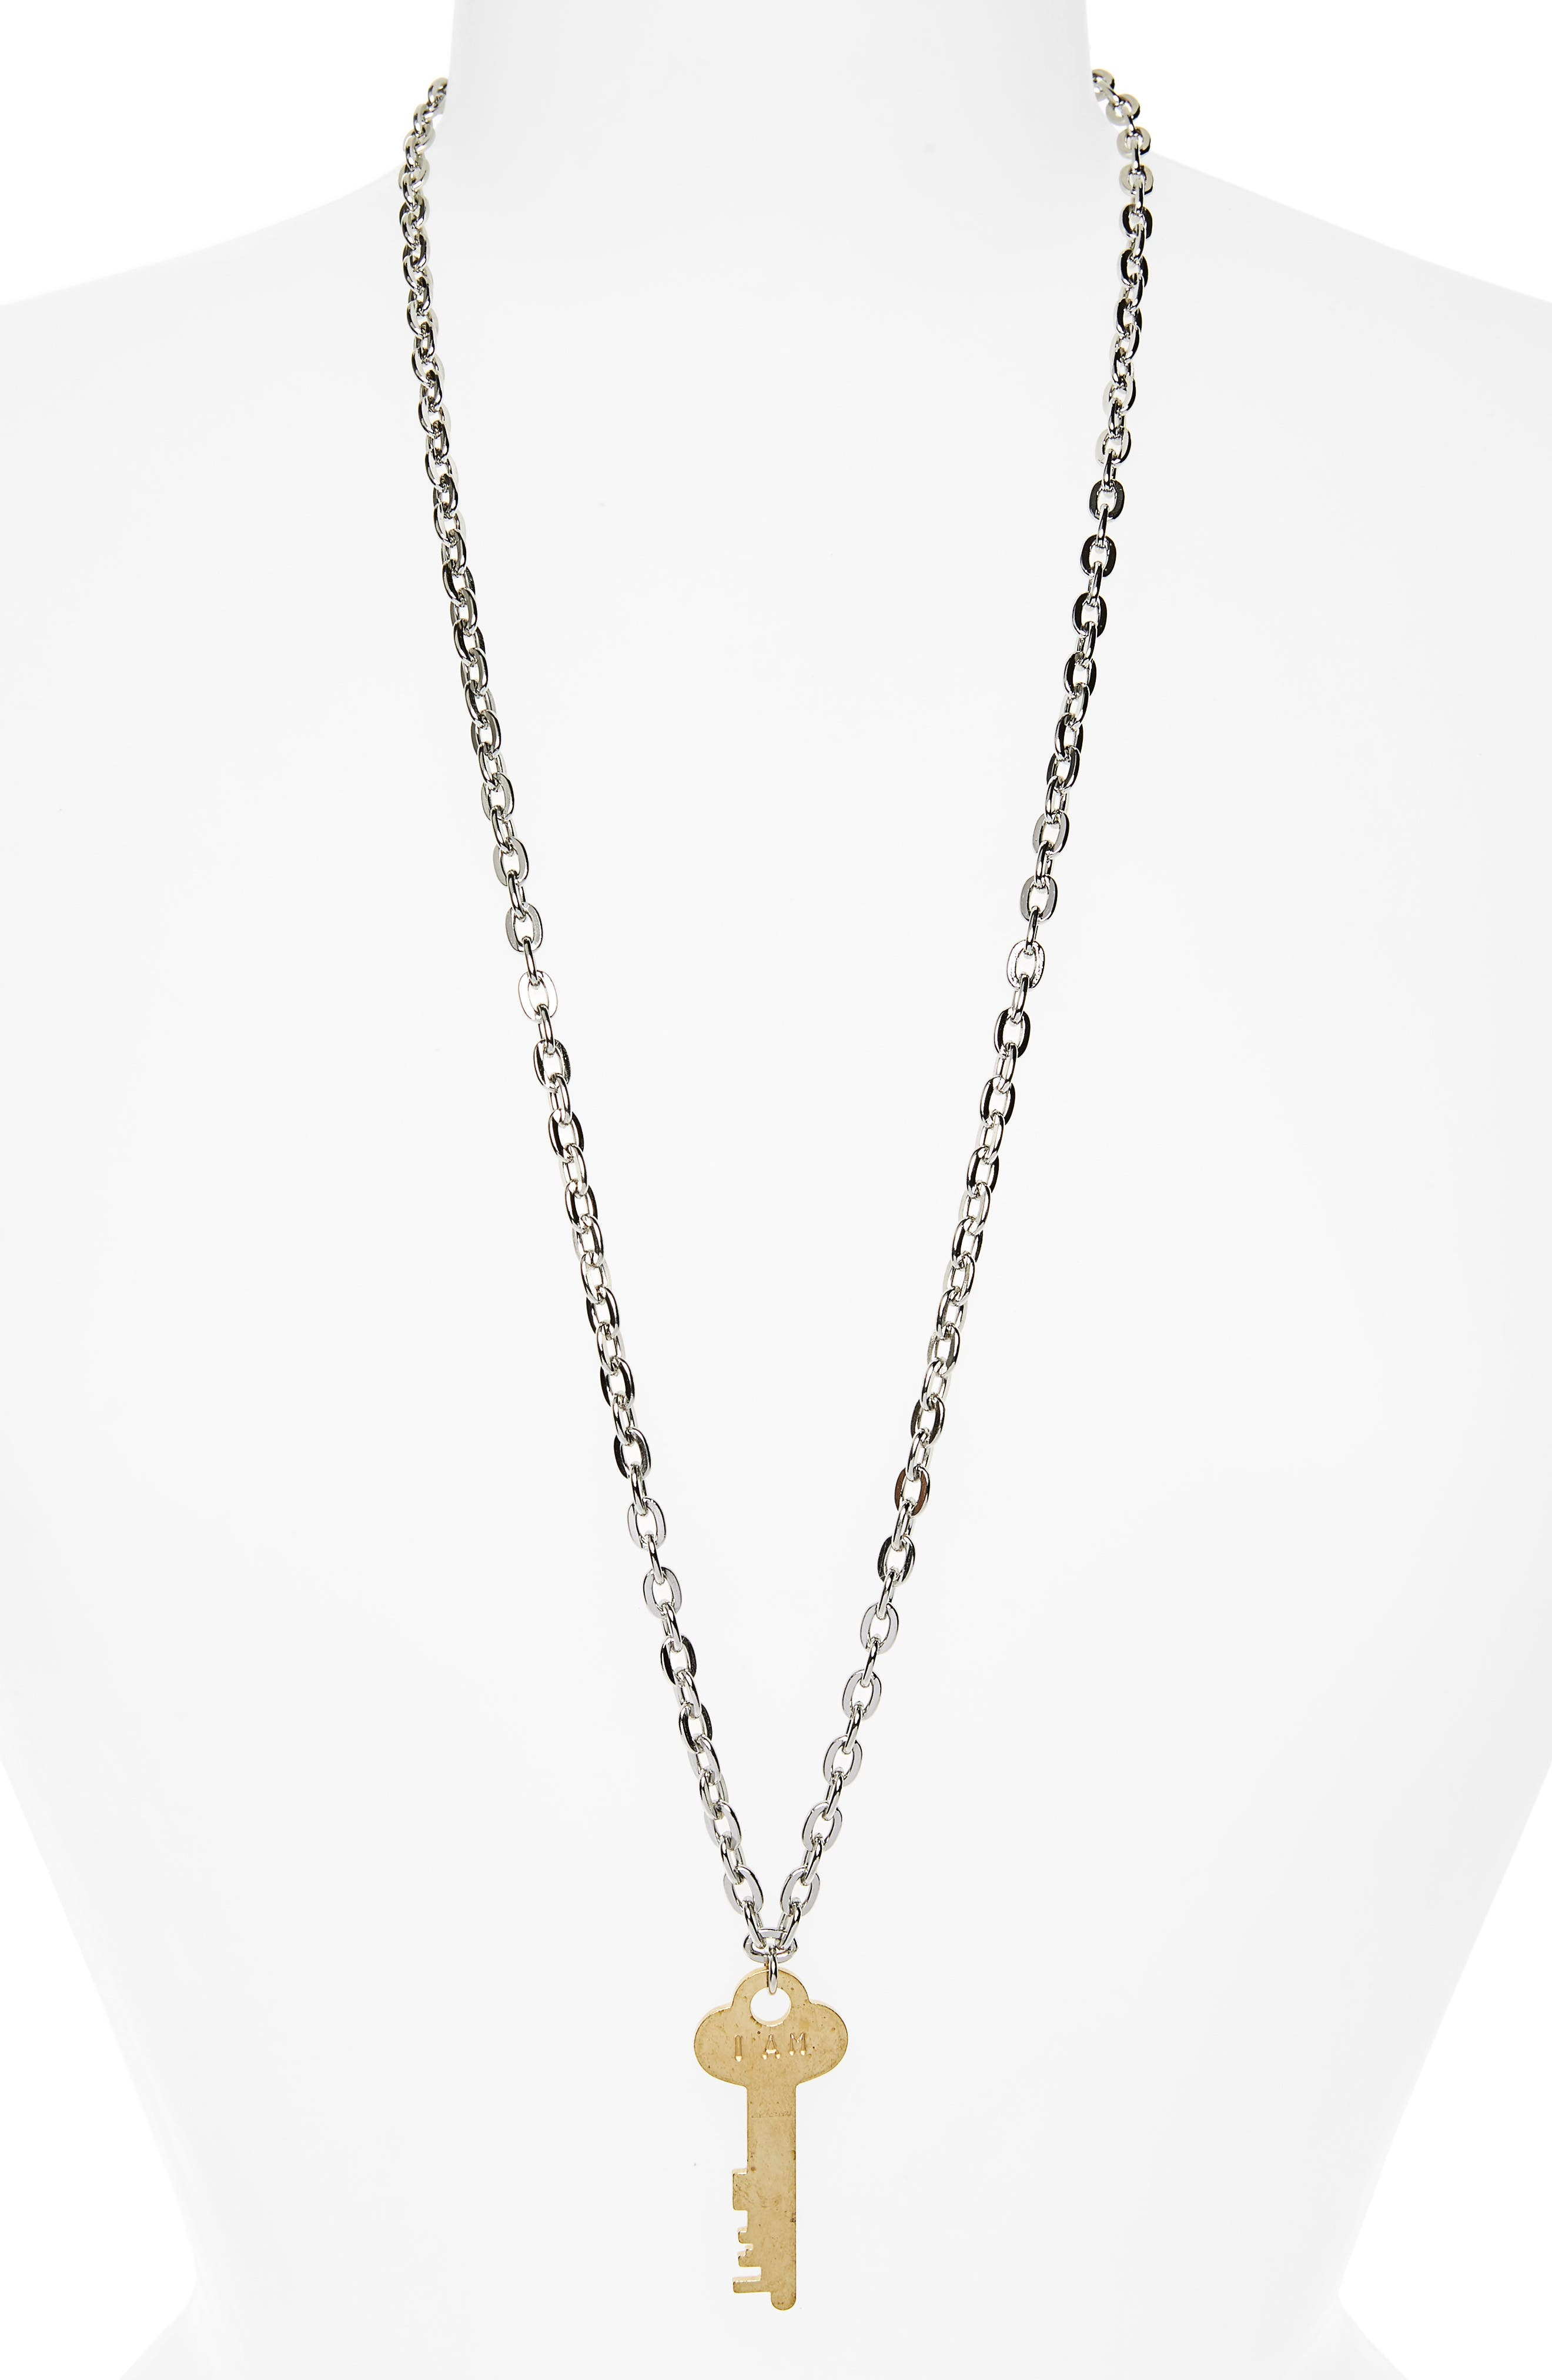 I Am Enough Key Charm Necklace,                         Main,                         color, Silver/ Gold Key